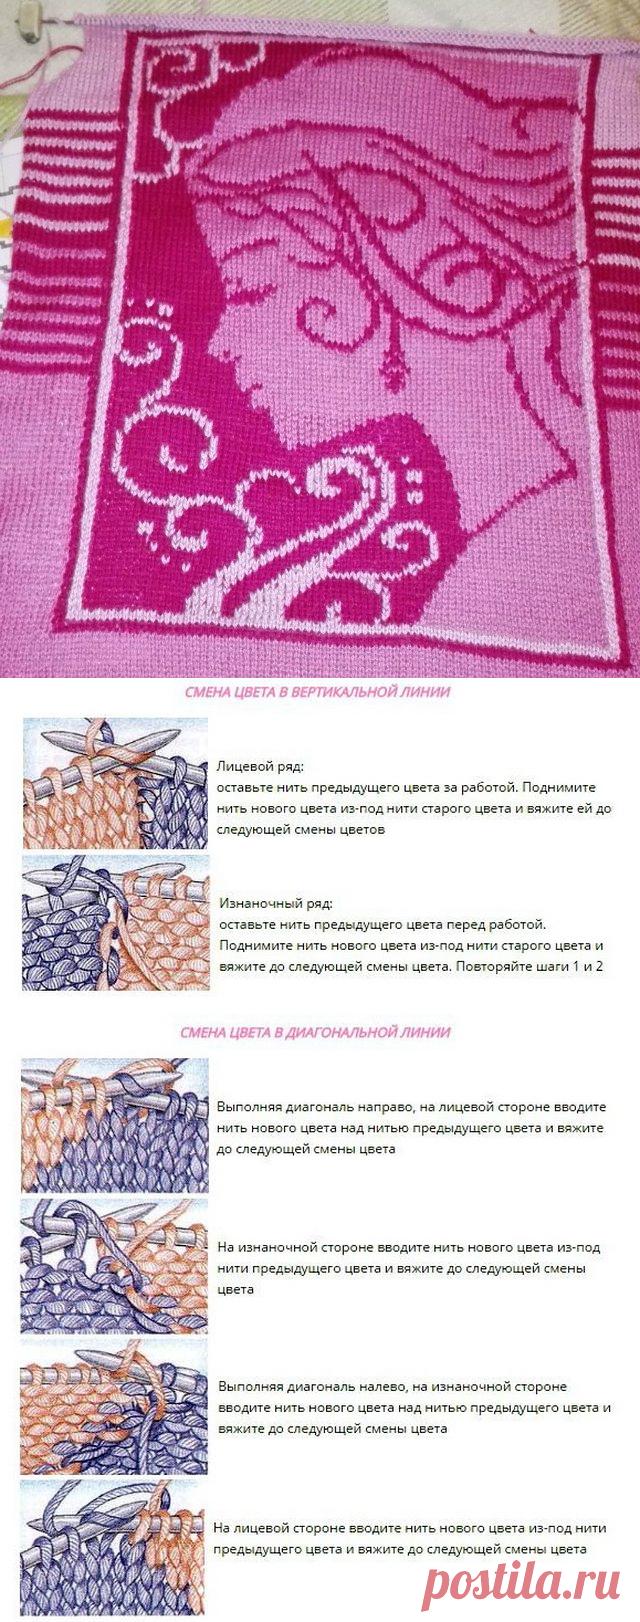 Интарсия - простая техника многоцветного вязания